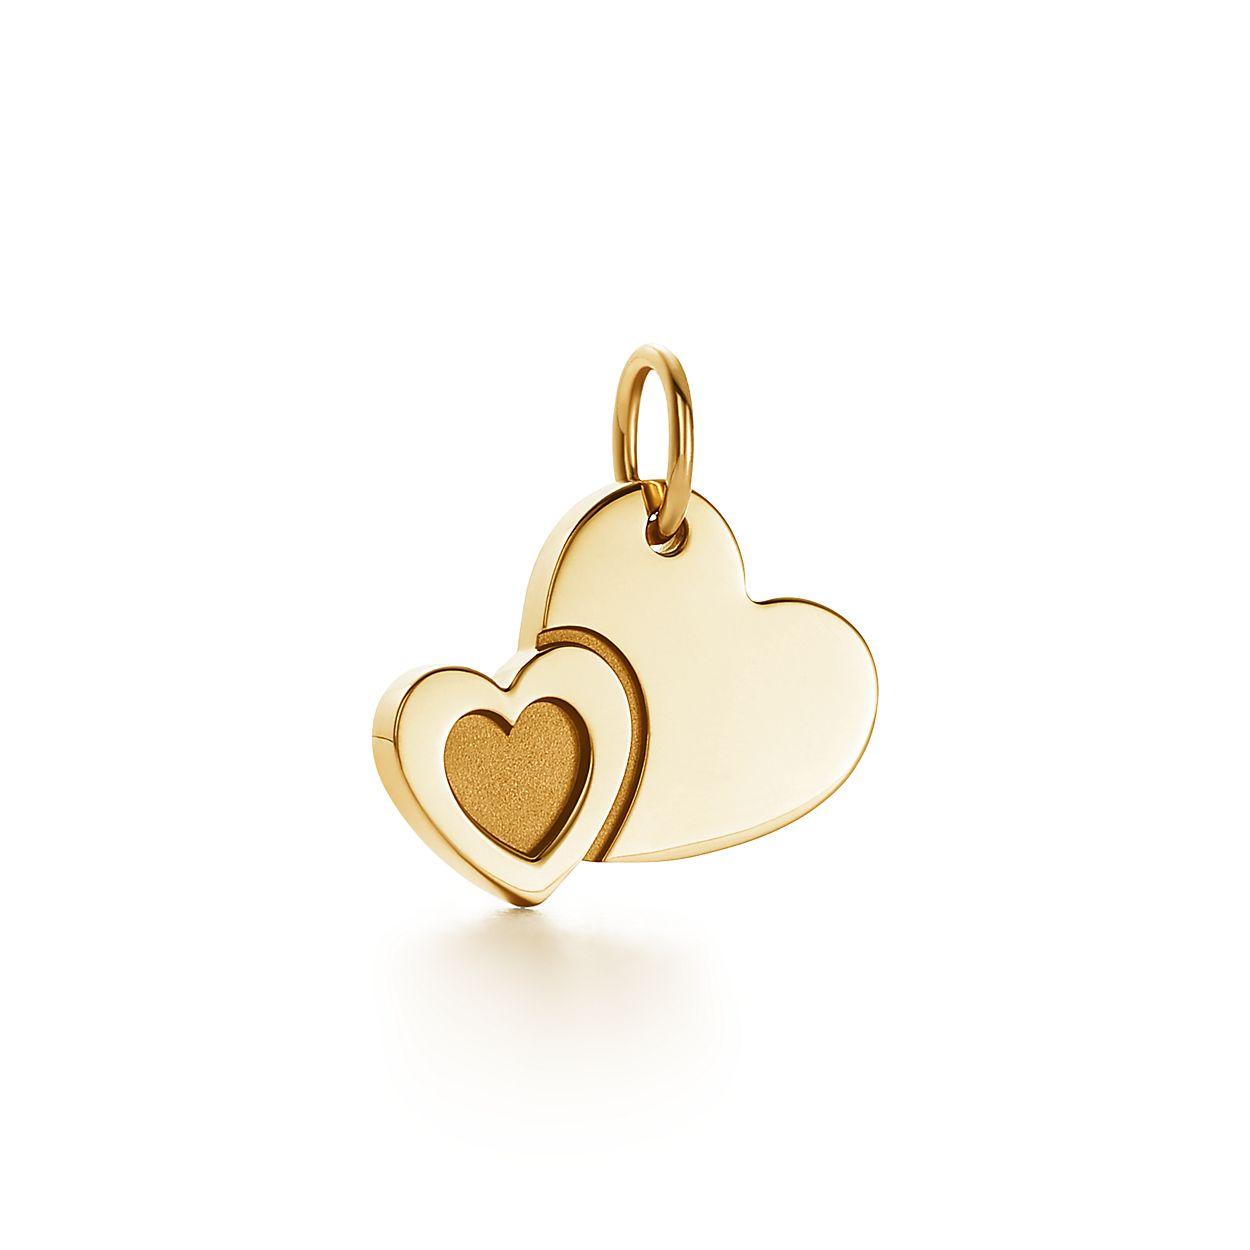 tiffany charms sweet heart charm in 18k gold tiffany co